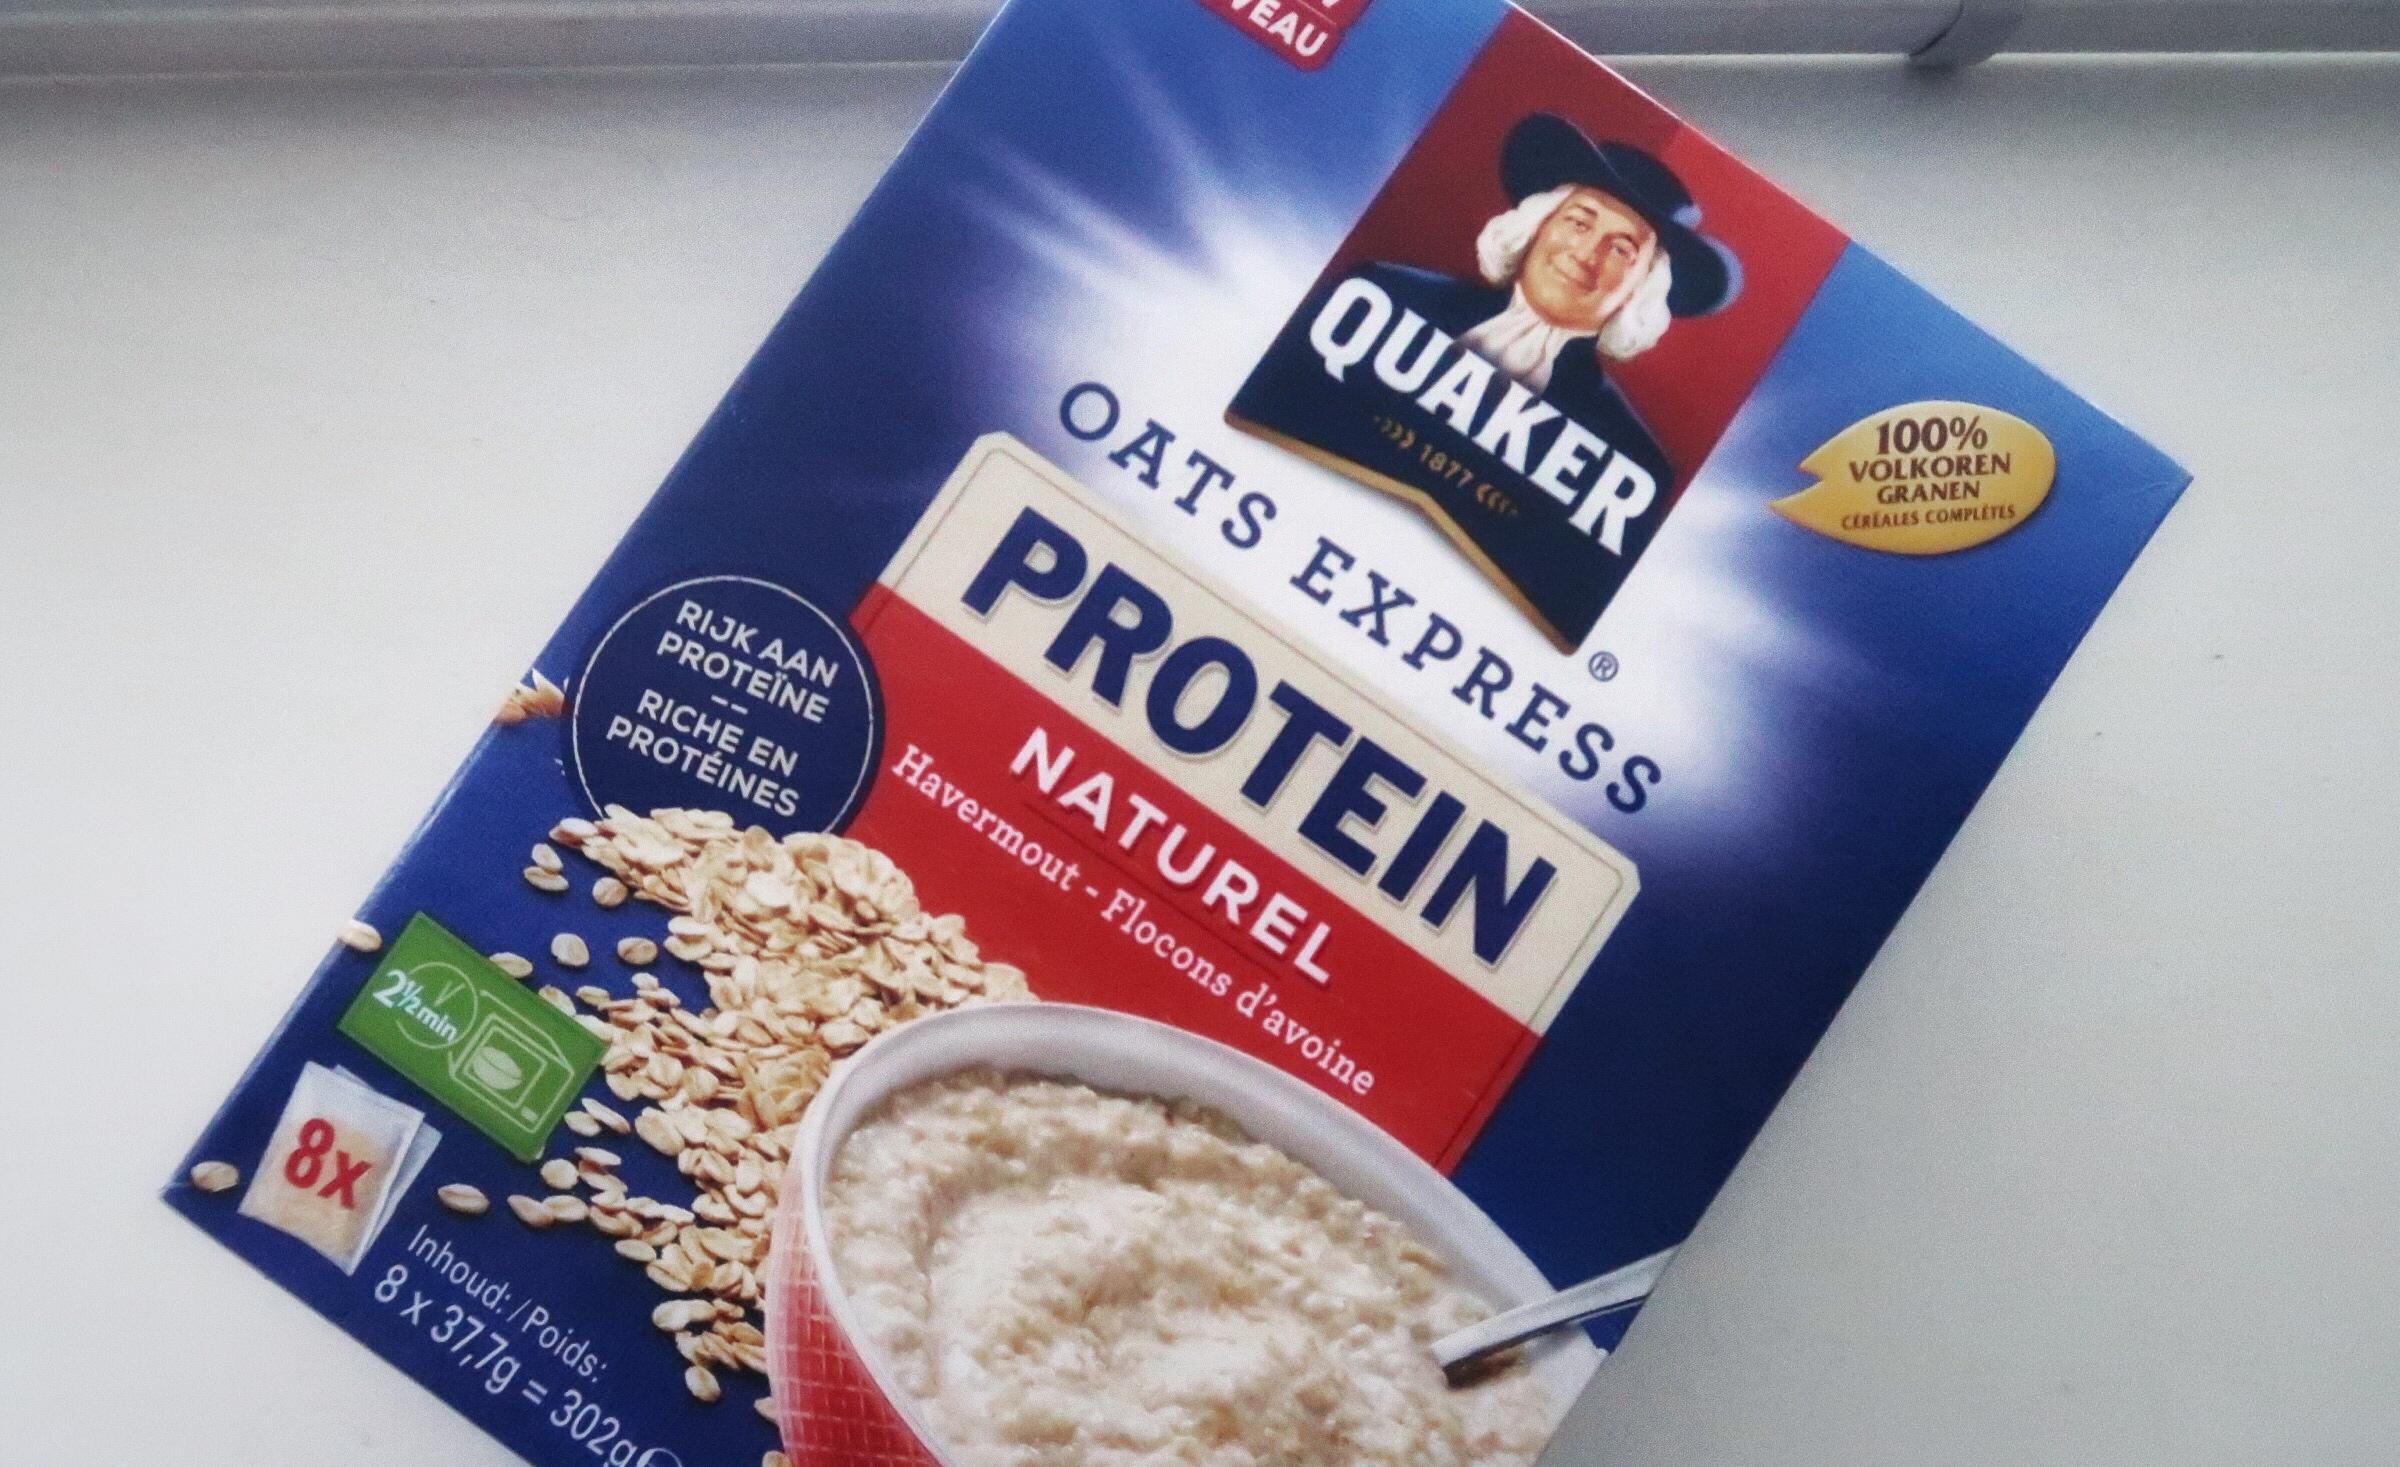 quacker protein, product tips, gezonde levensstijl, gymjunkie lifestyle plan, gezond afvallen